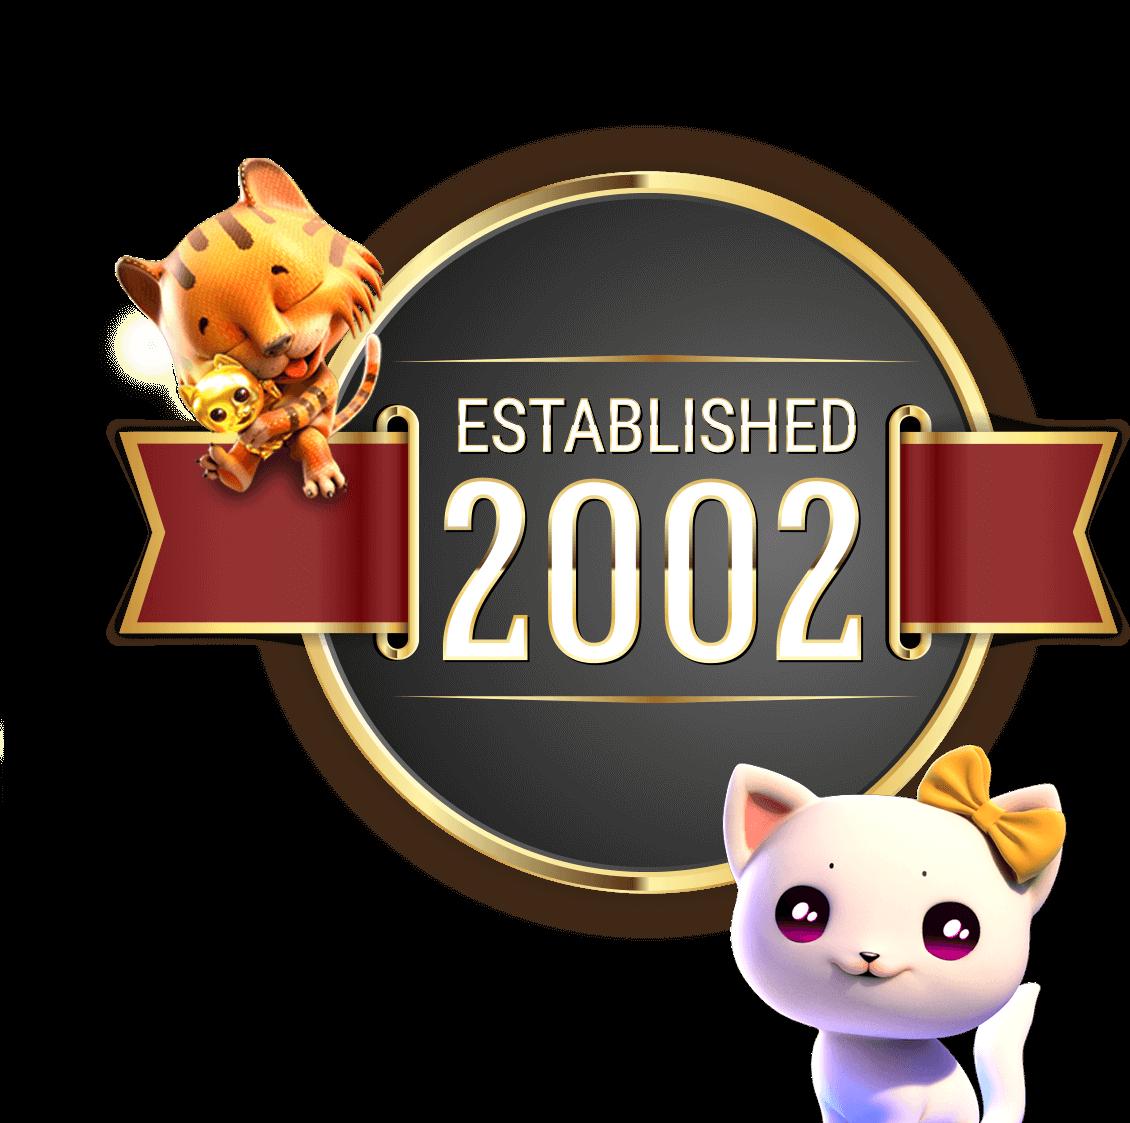 Since 2002